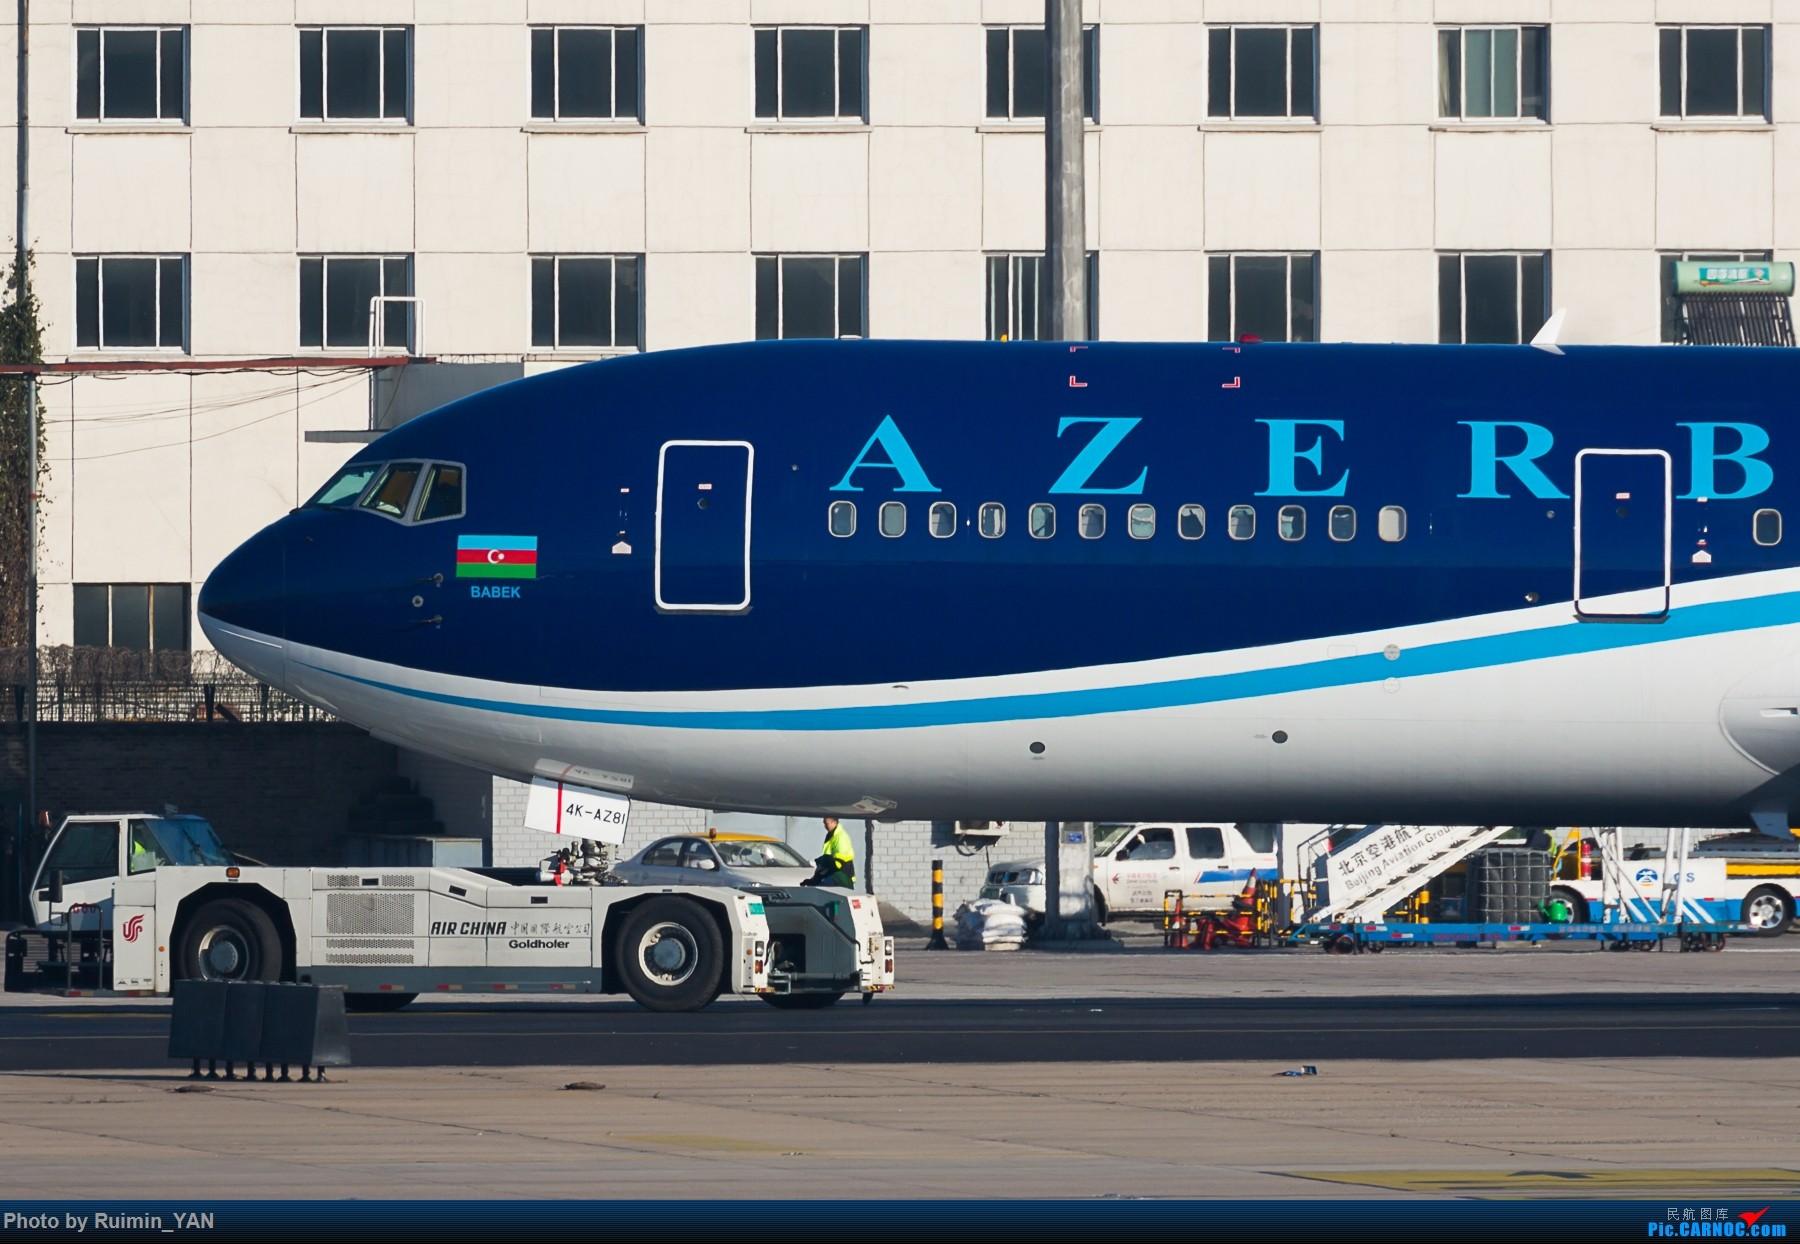 Re:[原创]【PEK】阿塞拜疆(J2, Azerbaijan Airlines)Boeing 763ER 4K-AZ81 BOEING 767-300ER 4K-AZ81 中国北京首都国际机场